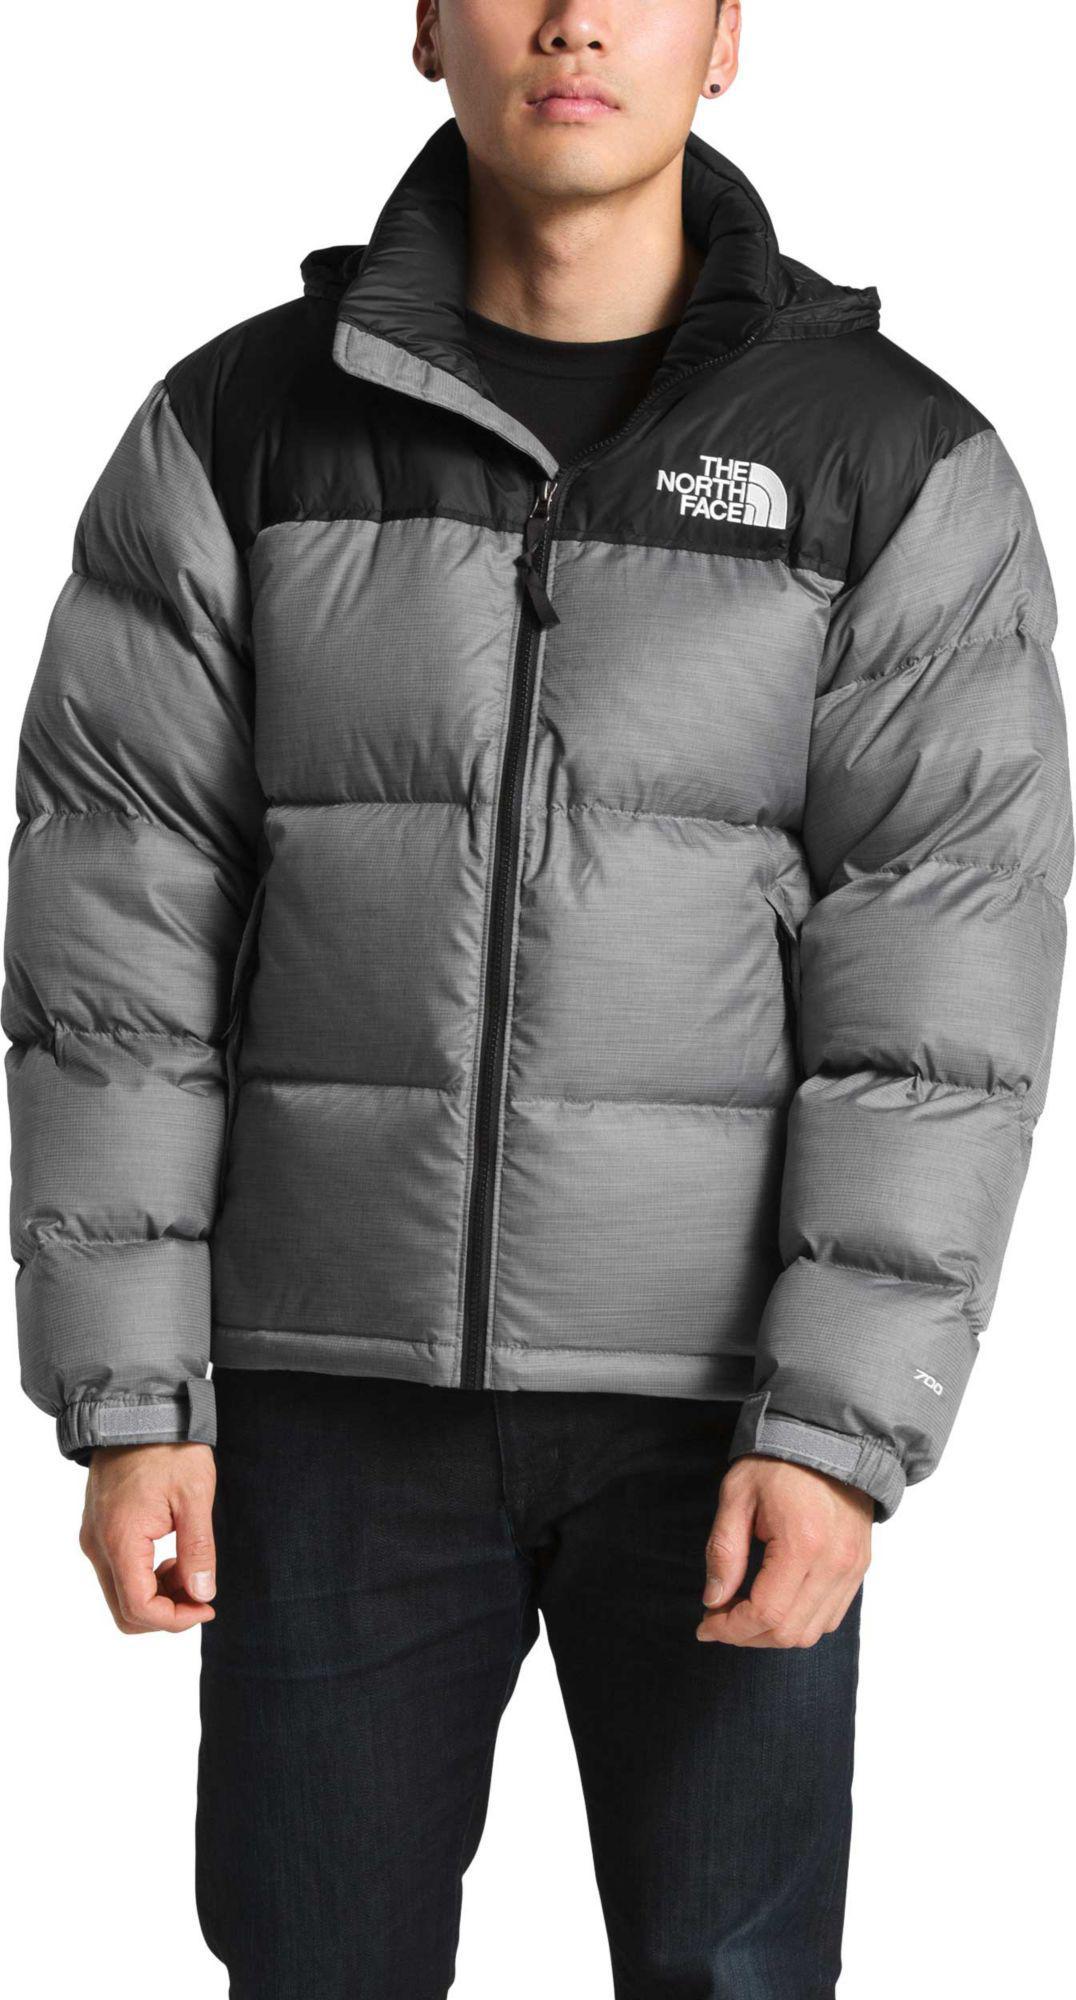 25e70ab009 Lyst - The North Face 1996 Retro Nuptse Jacket in Gray for Men ...